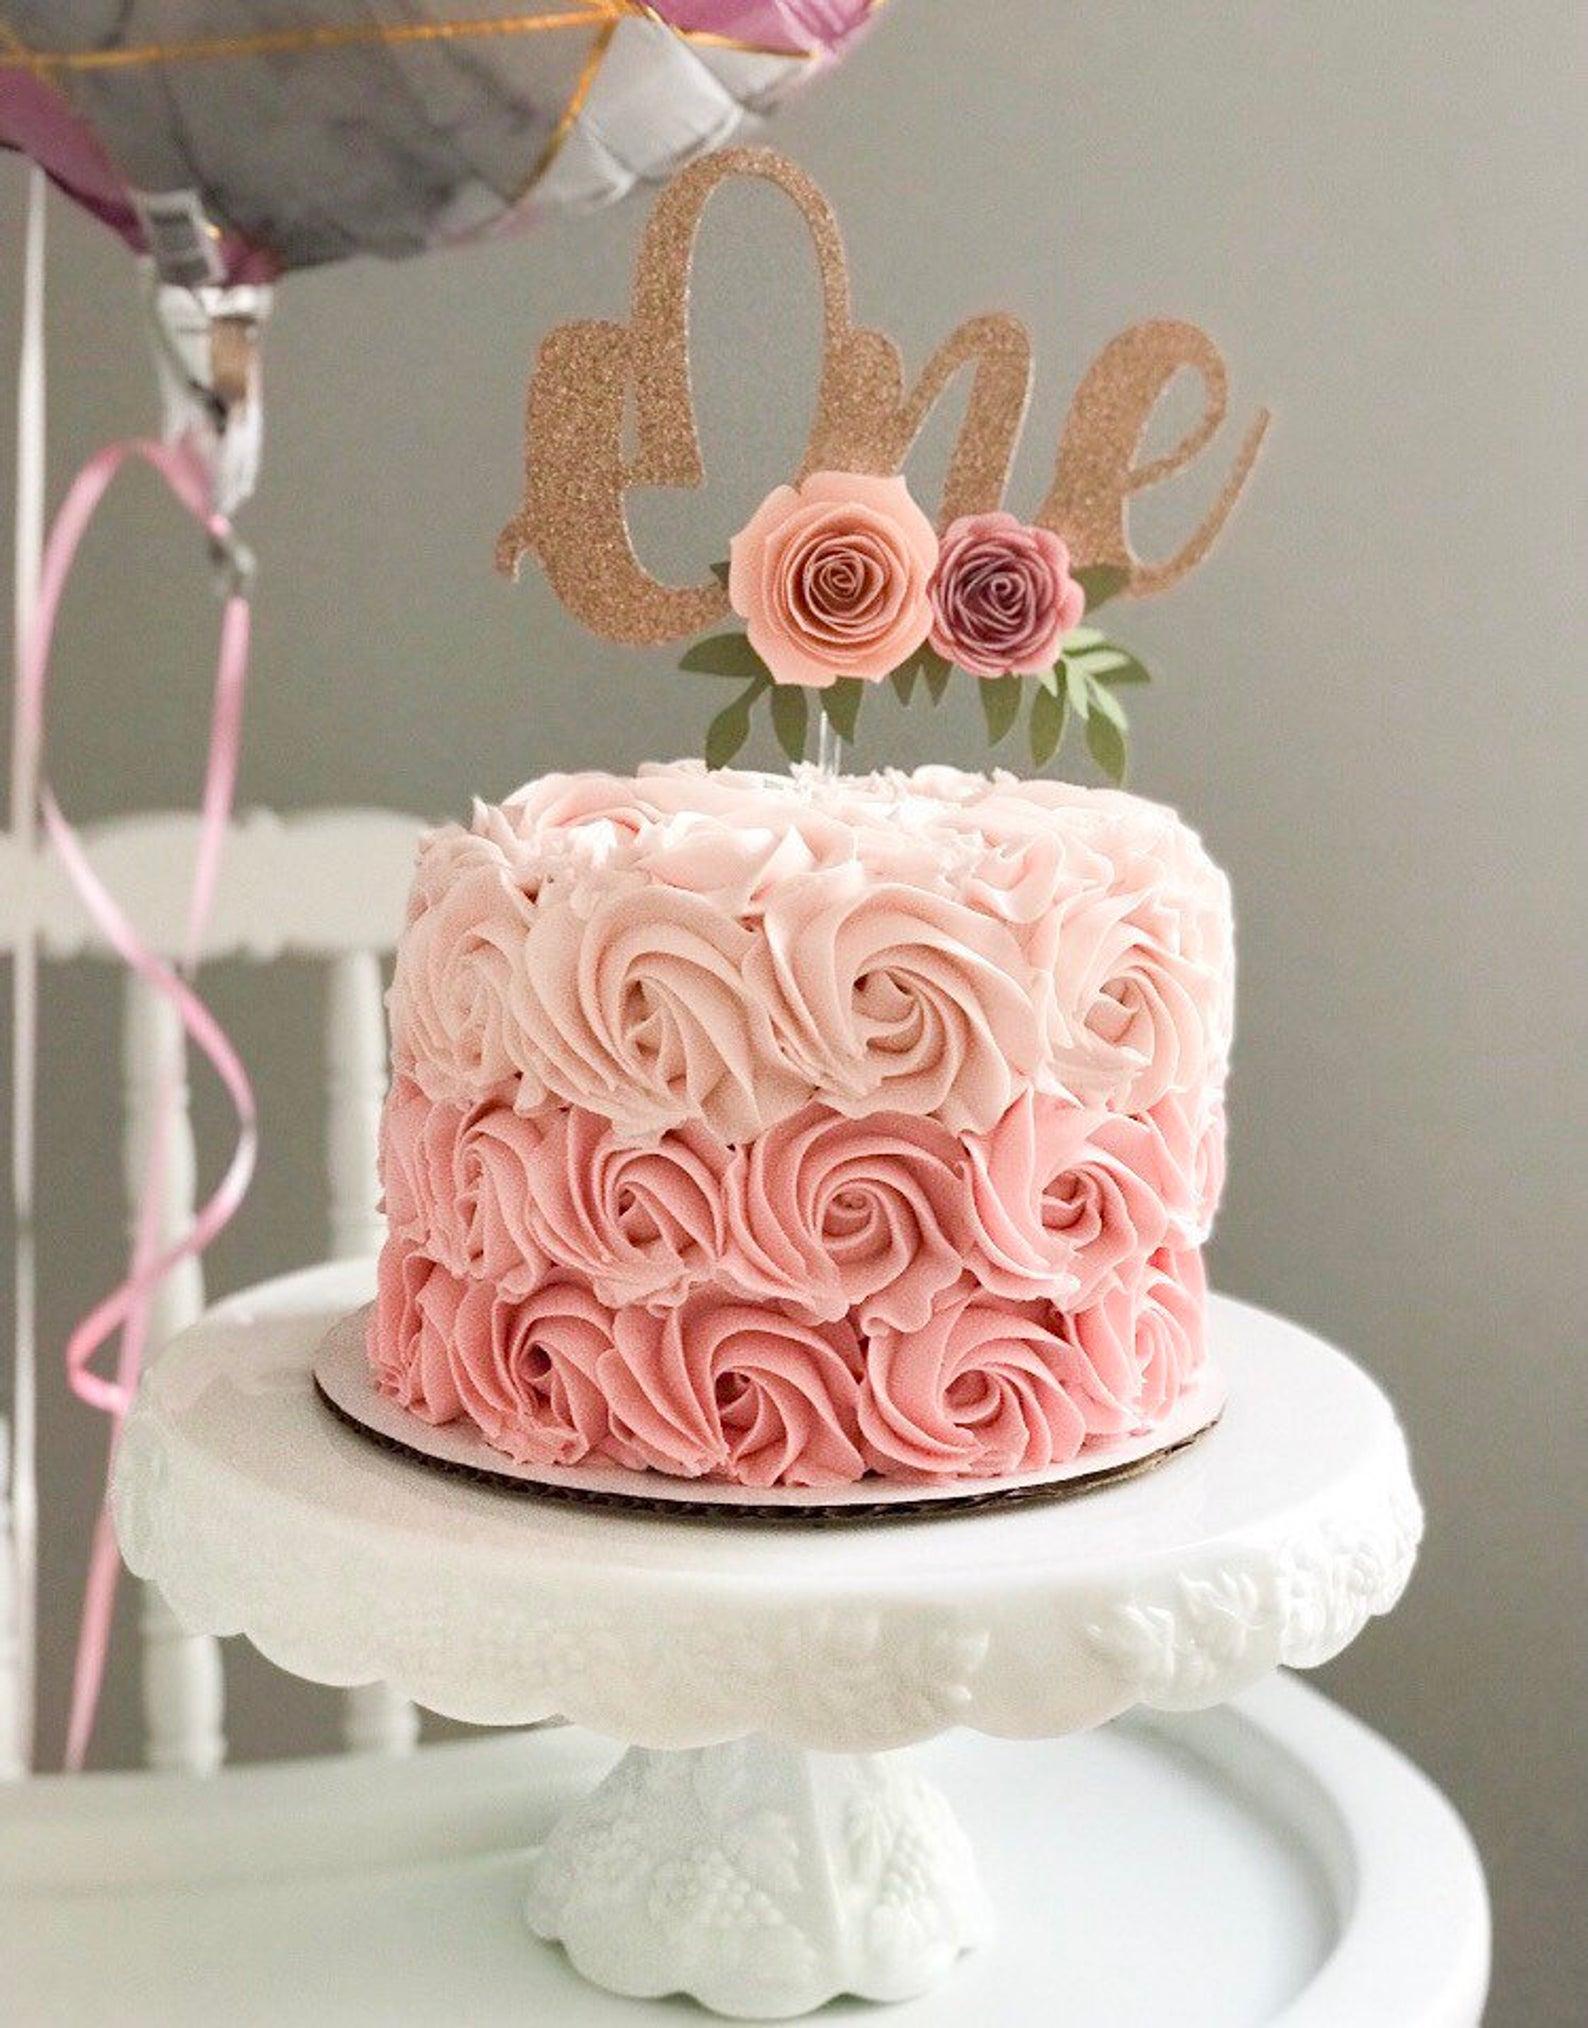 Enjoyable One Year Old Cake Topper Floral Cake Topper Glitter Cake Topper Funny Birthday Cards Online Inifodamsfinfo